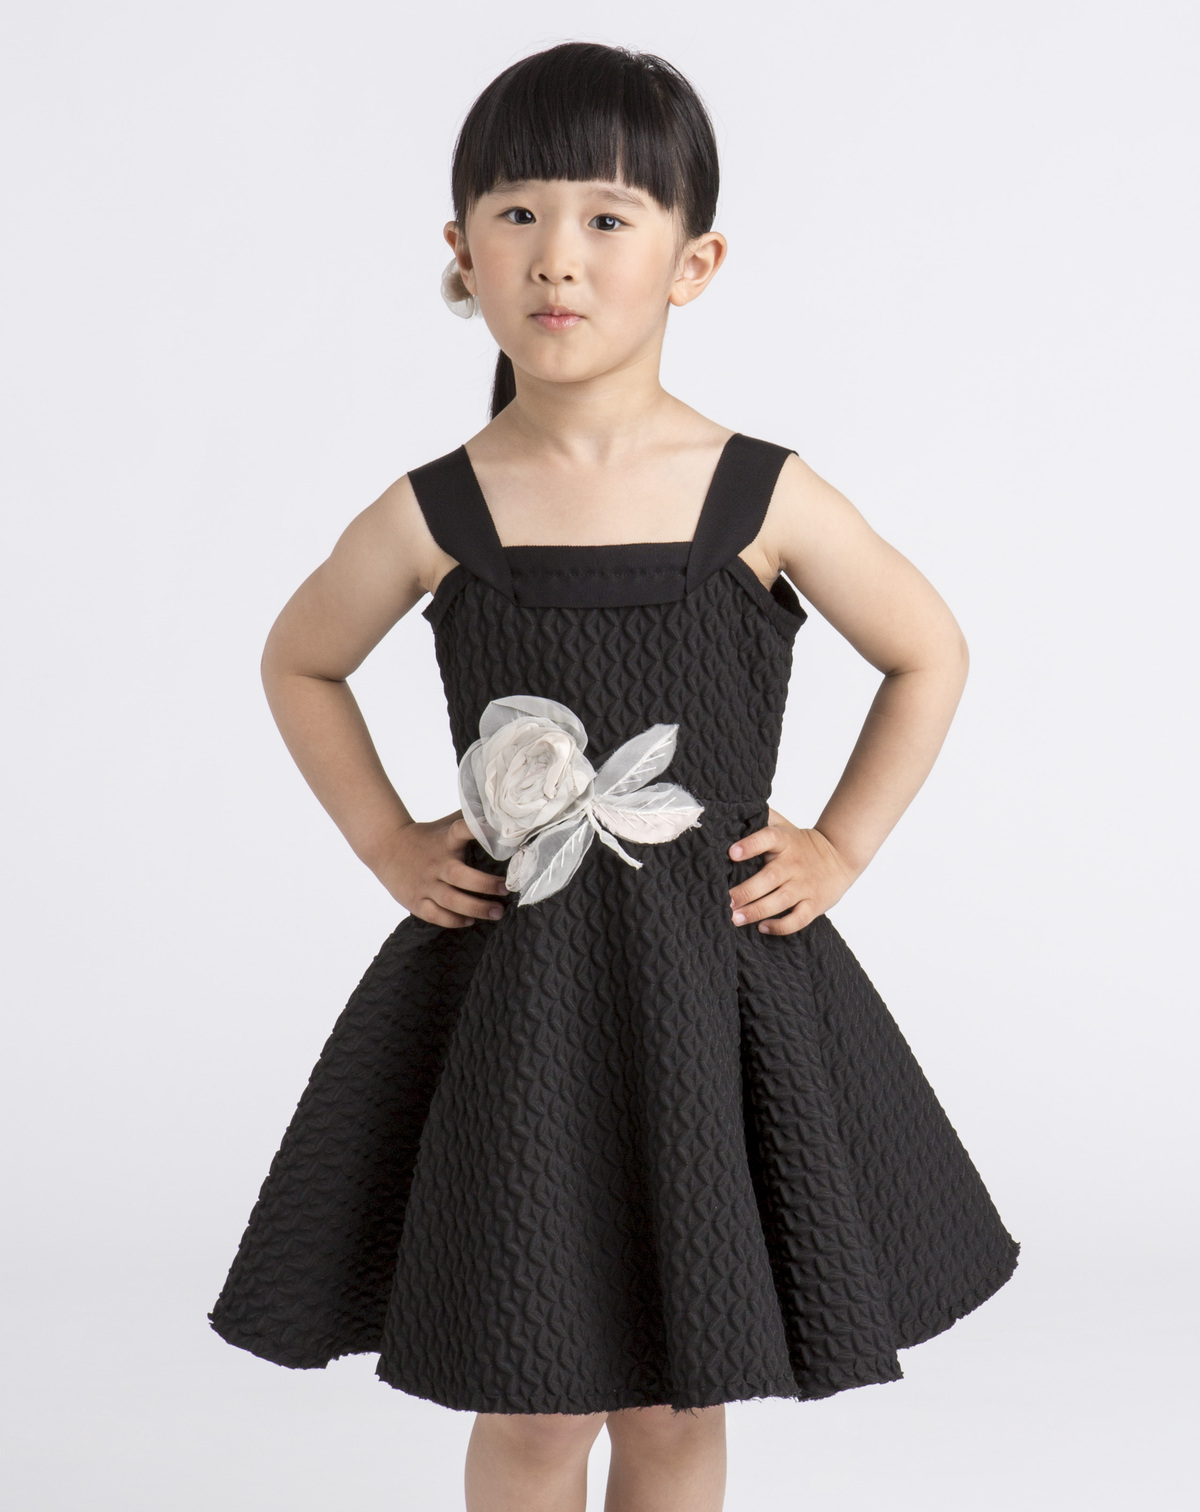 Lanvin Petite Spring Summer 2014 black embossed dress